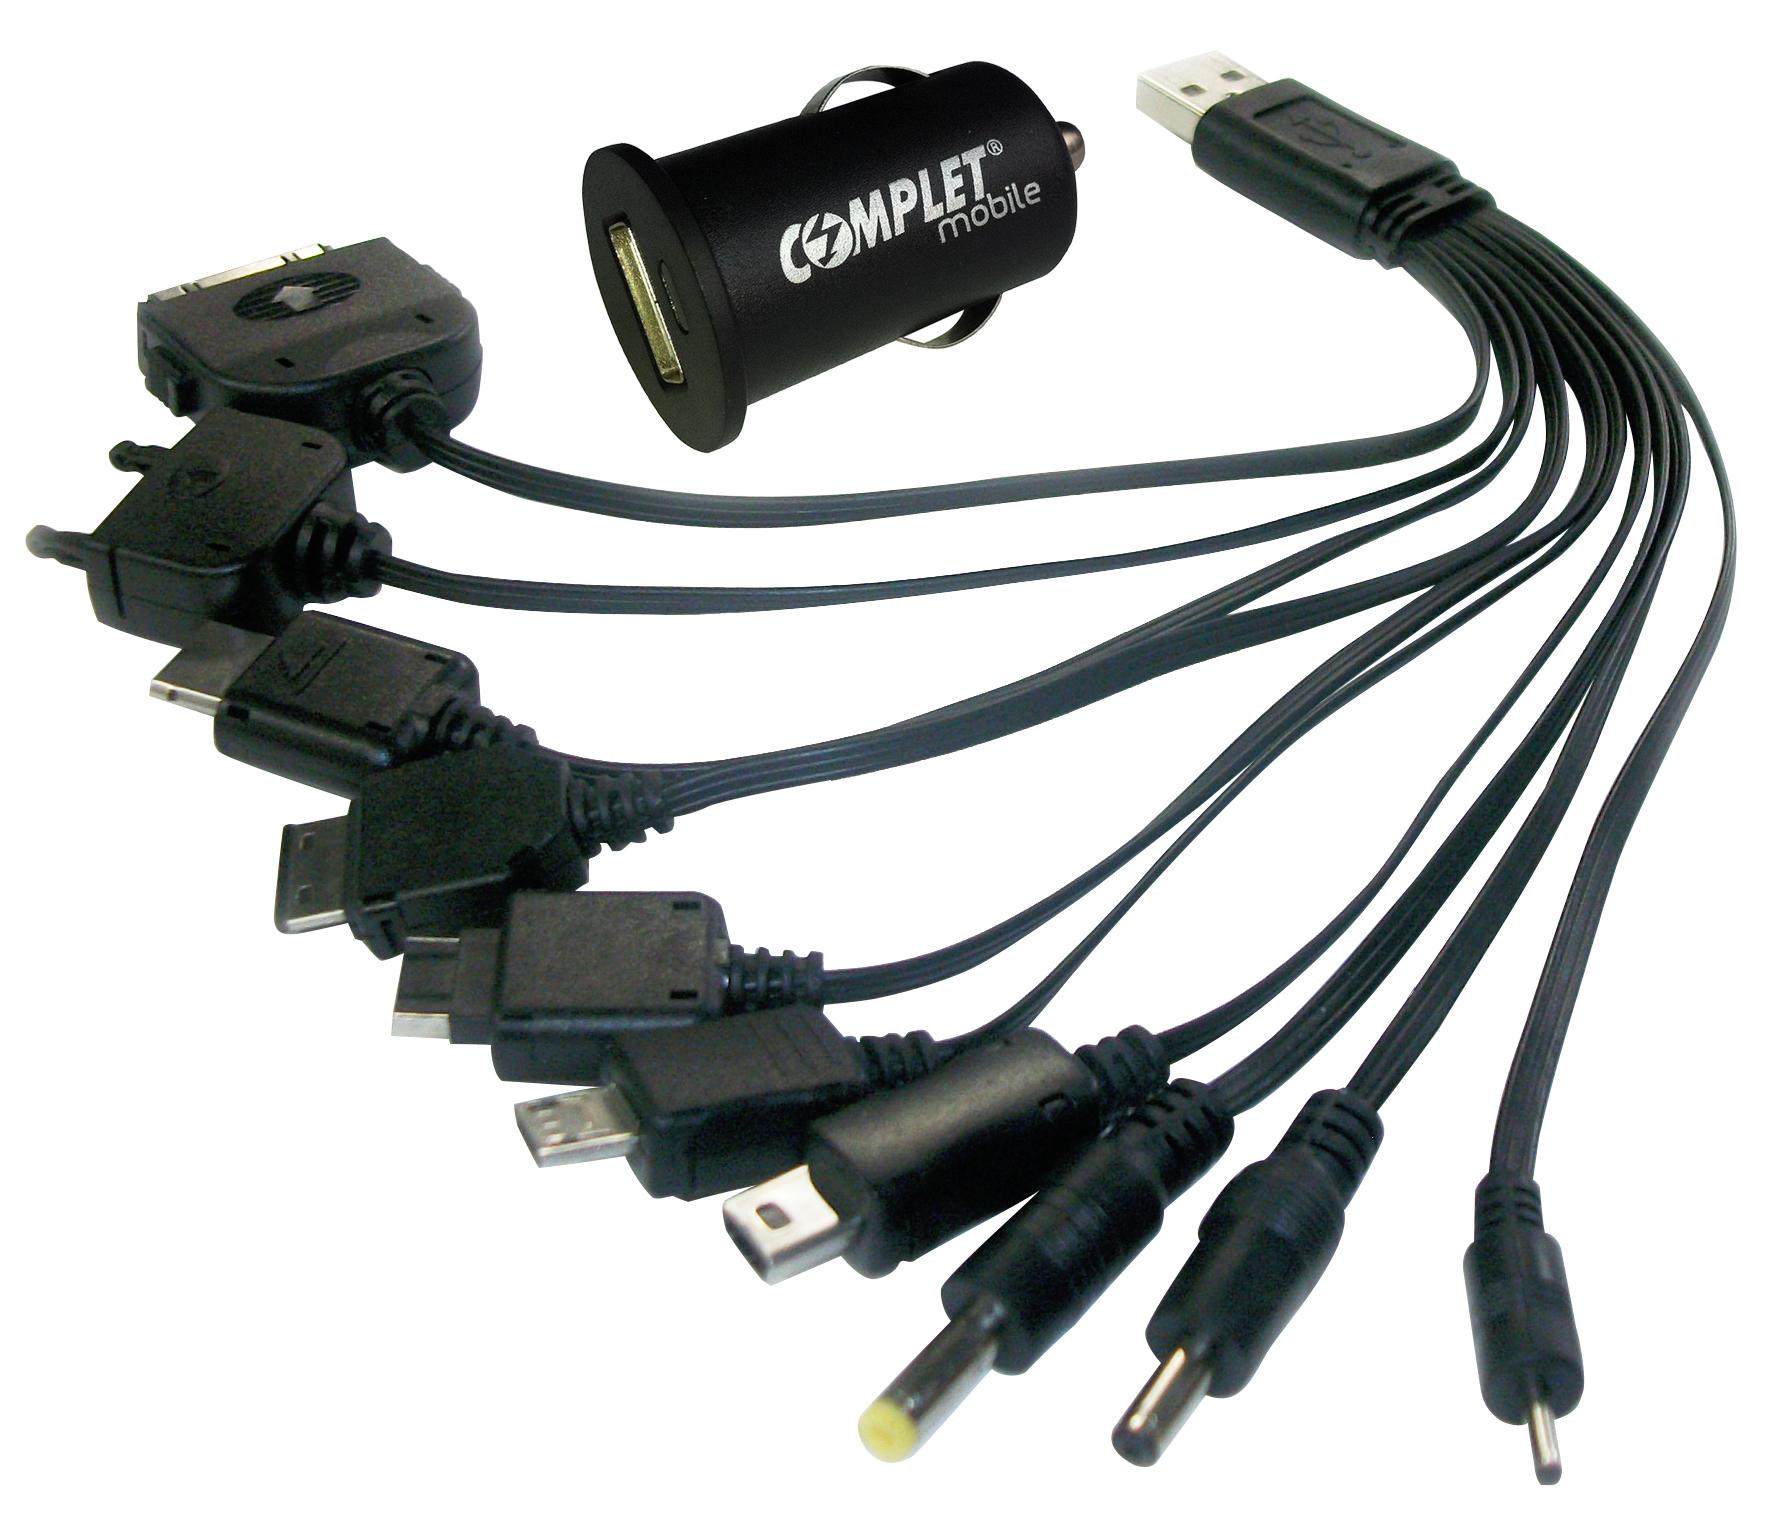 USB CARGADOR DE... Nokia N90